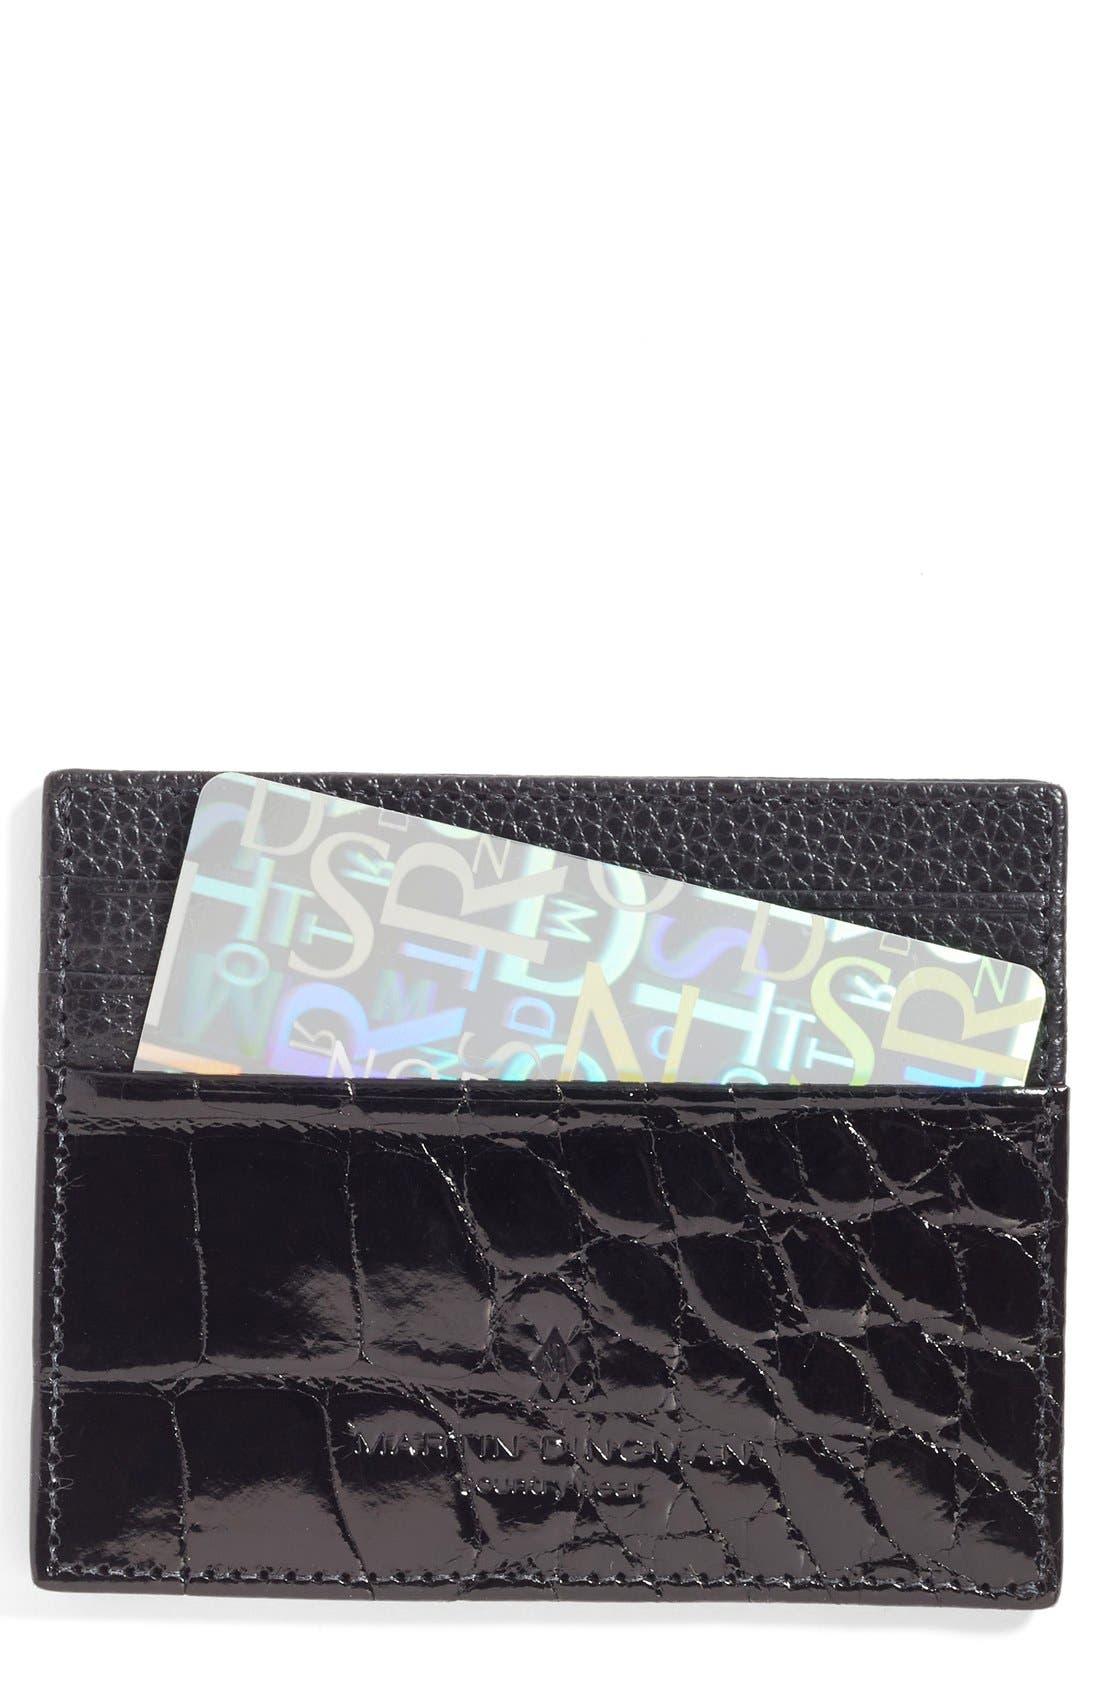 Executive Leather Card Case,                         Main,                         color,